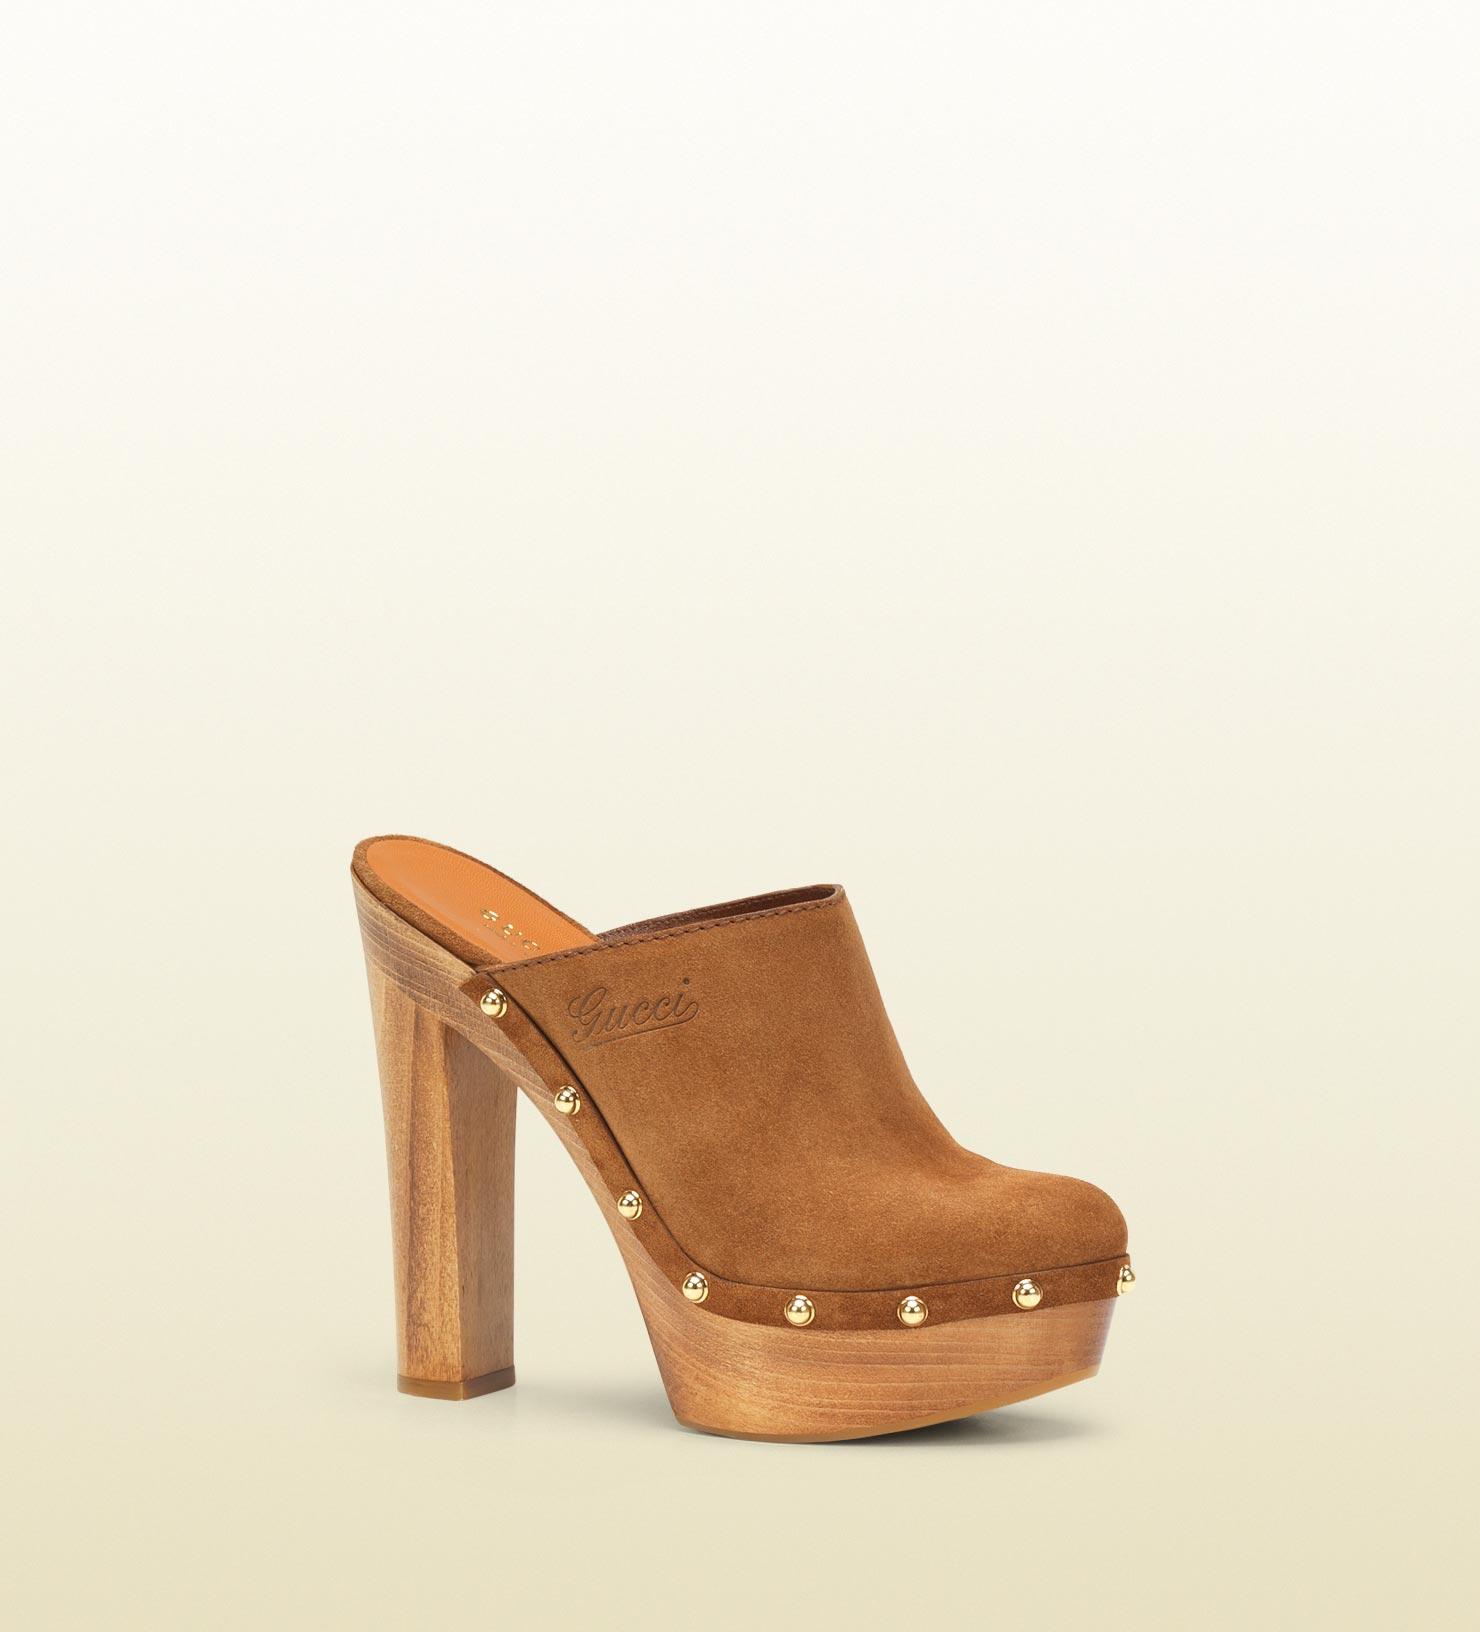 High Heel Clog Shoes